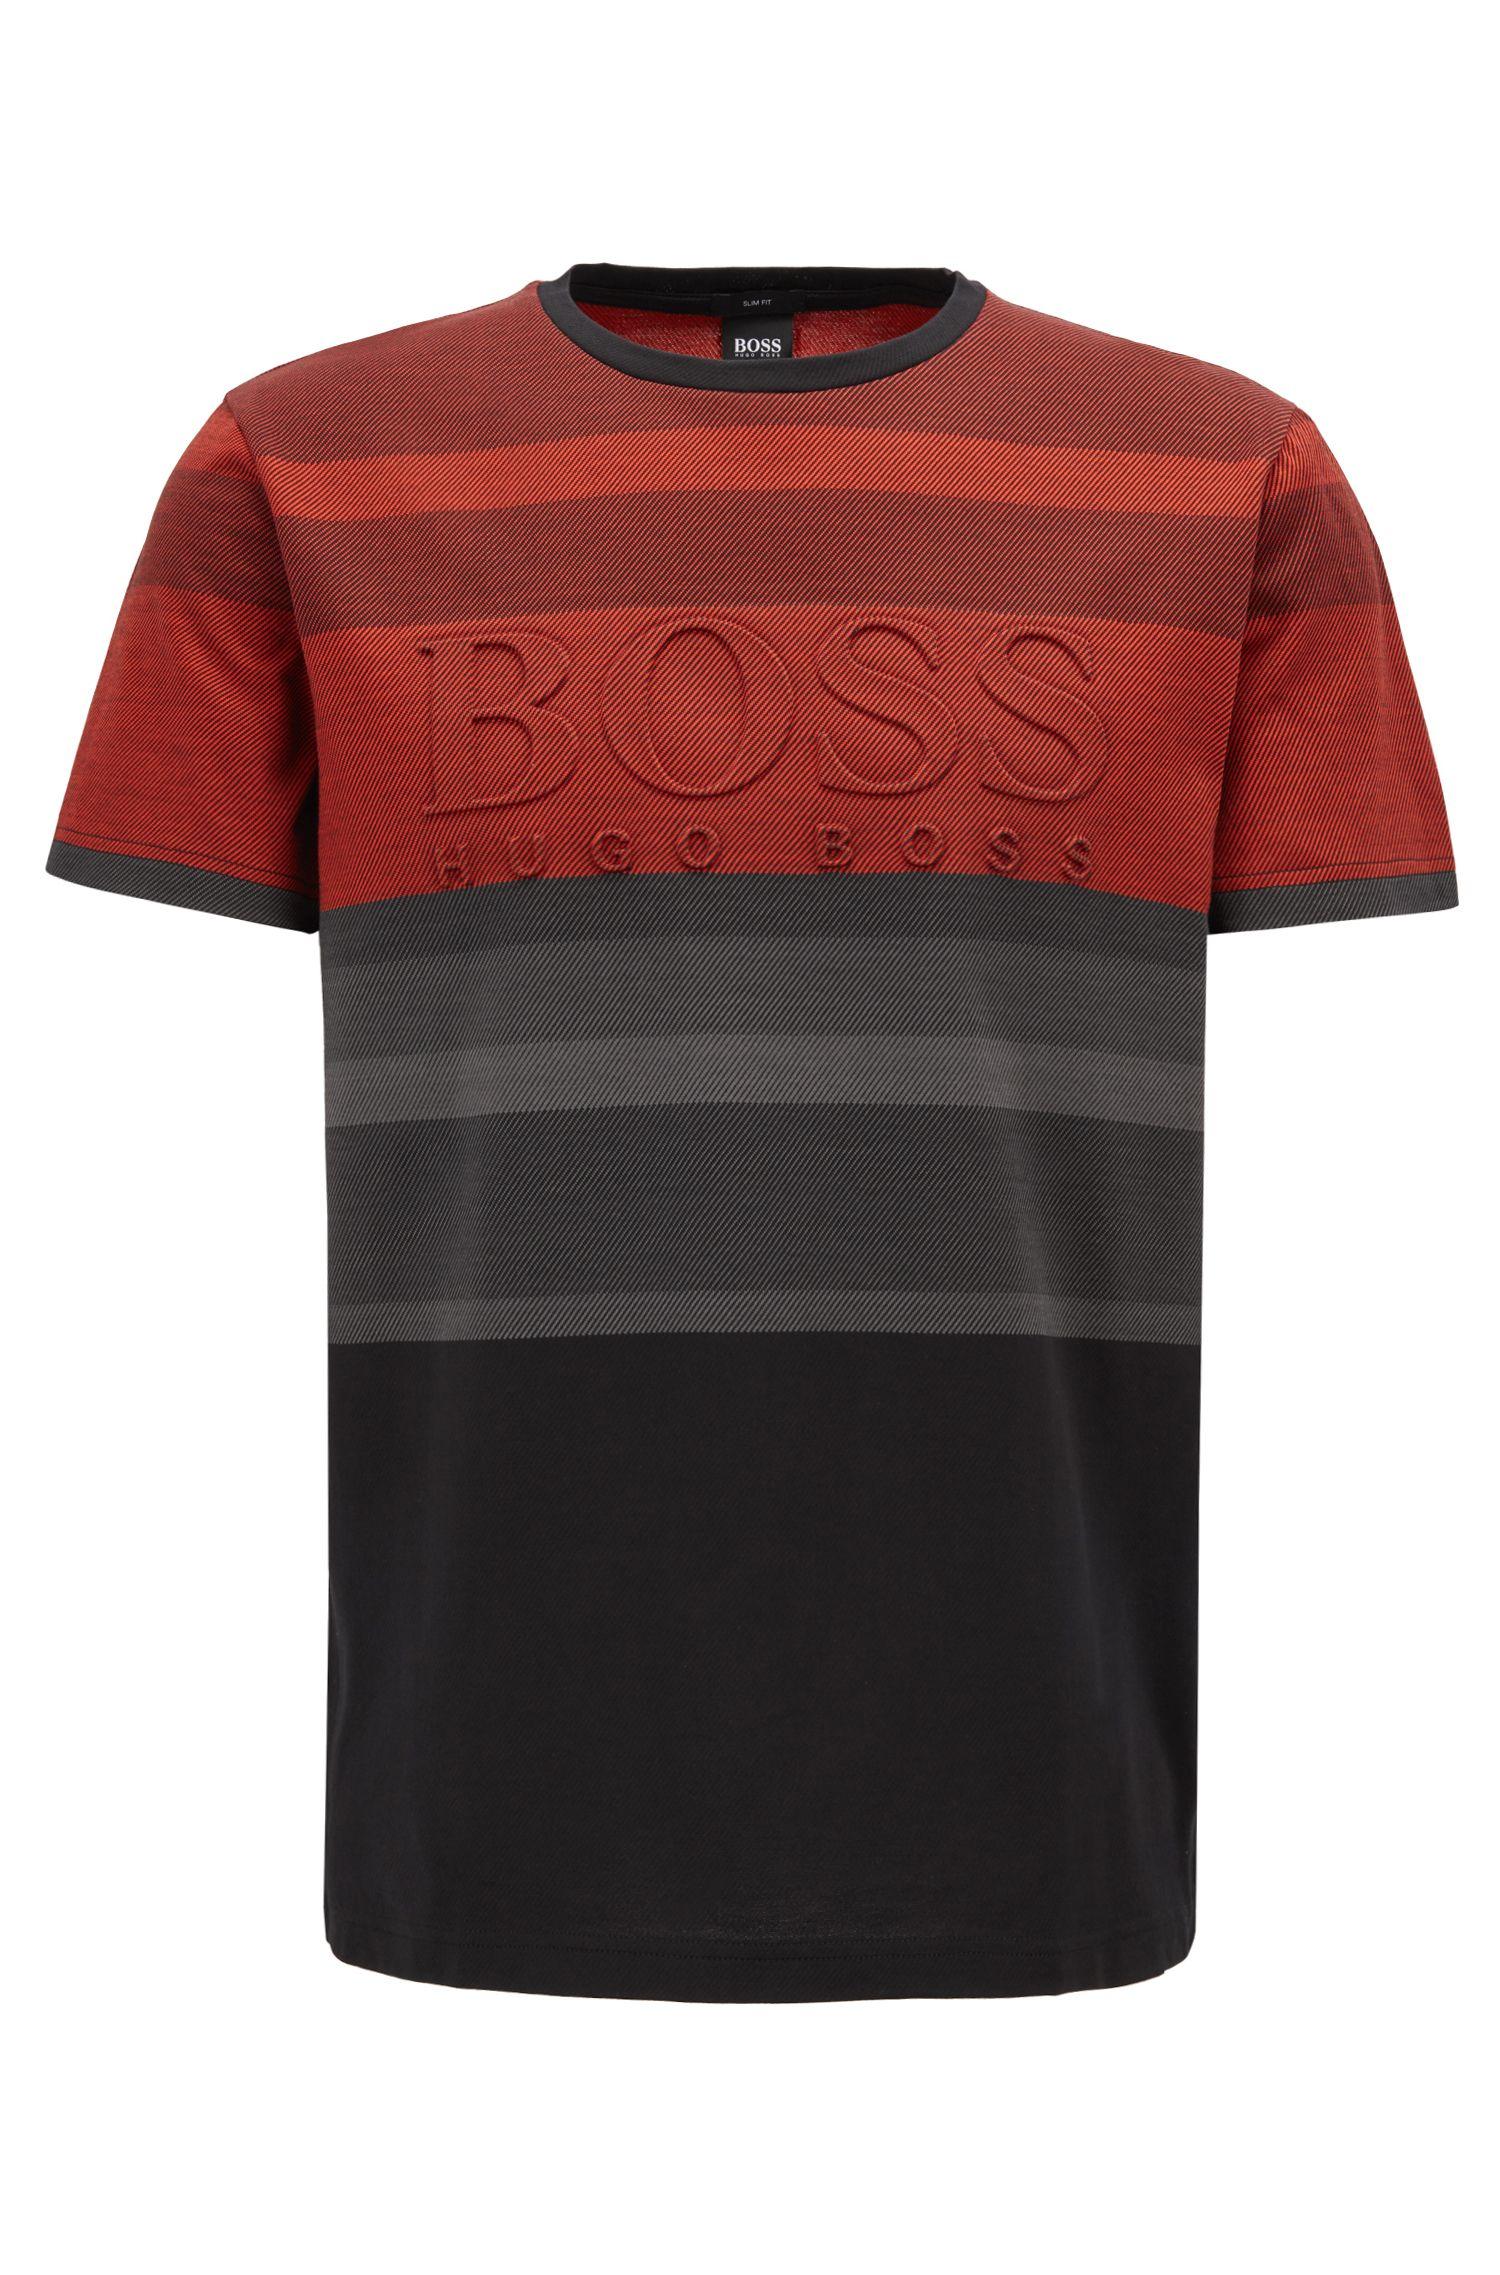 Cotton-jacquard T-shirt with irregular stripes and embossed logo, Black